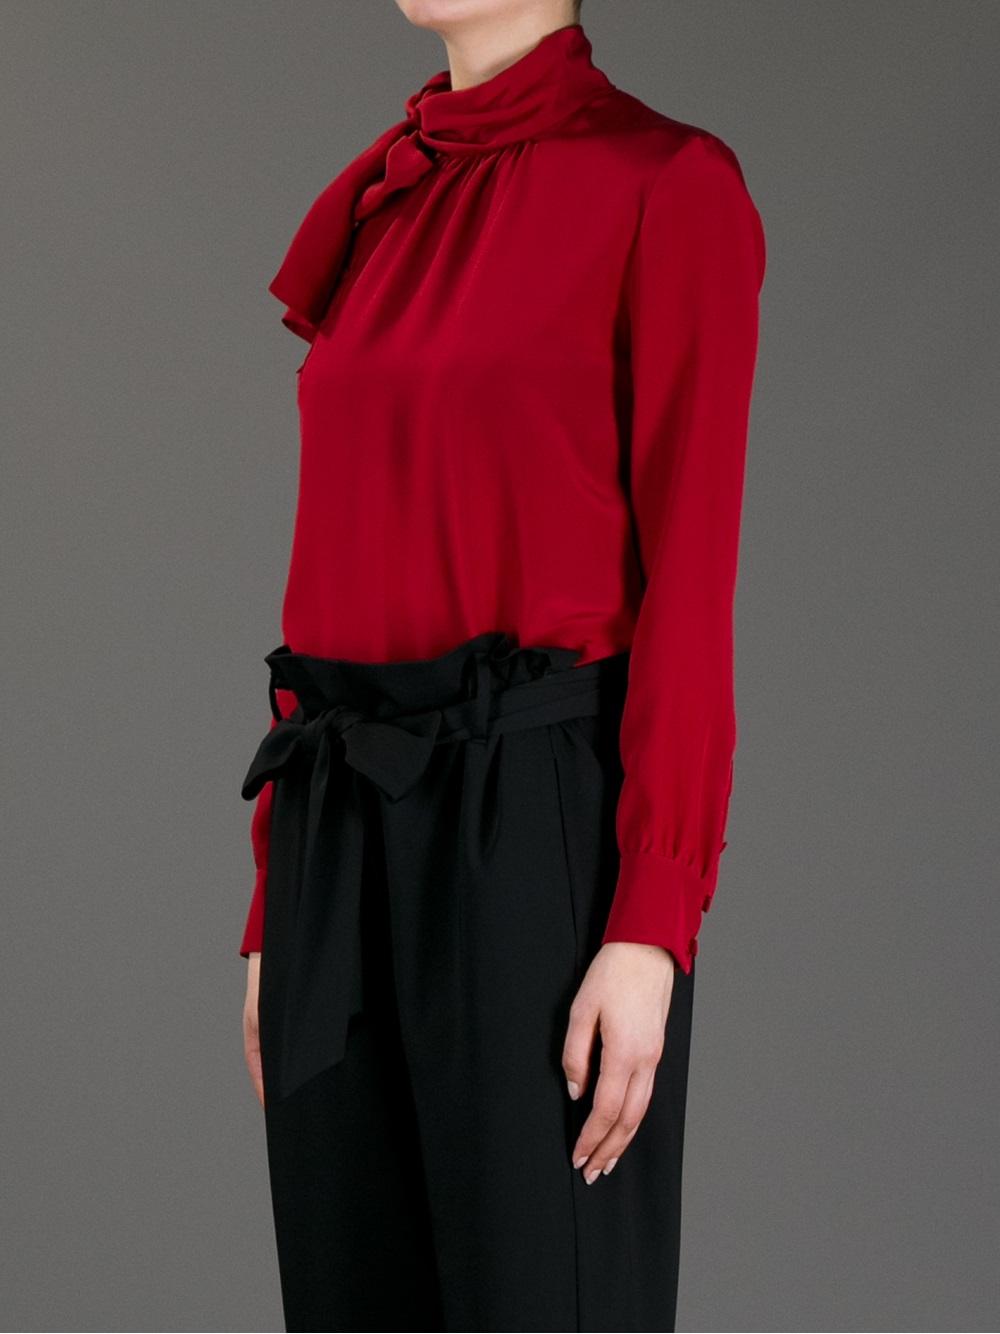 3a809490b9799f Lyst - Saint Laurent Silk Blouse in Red